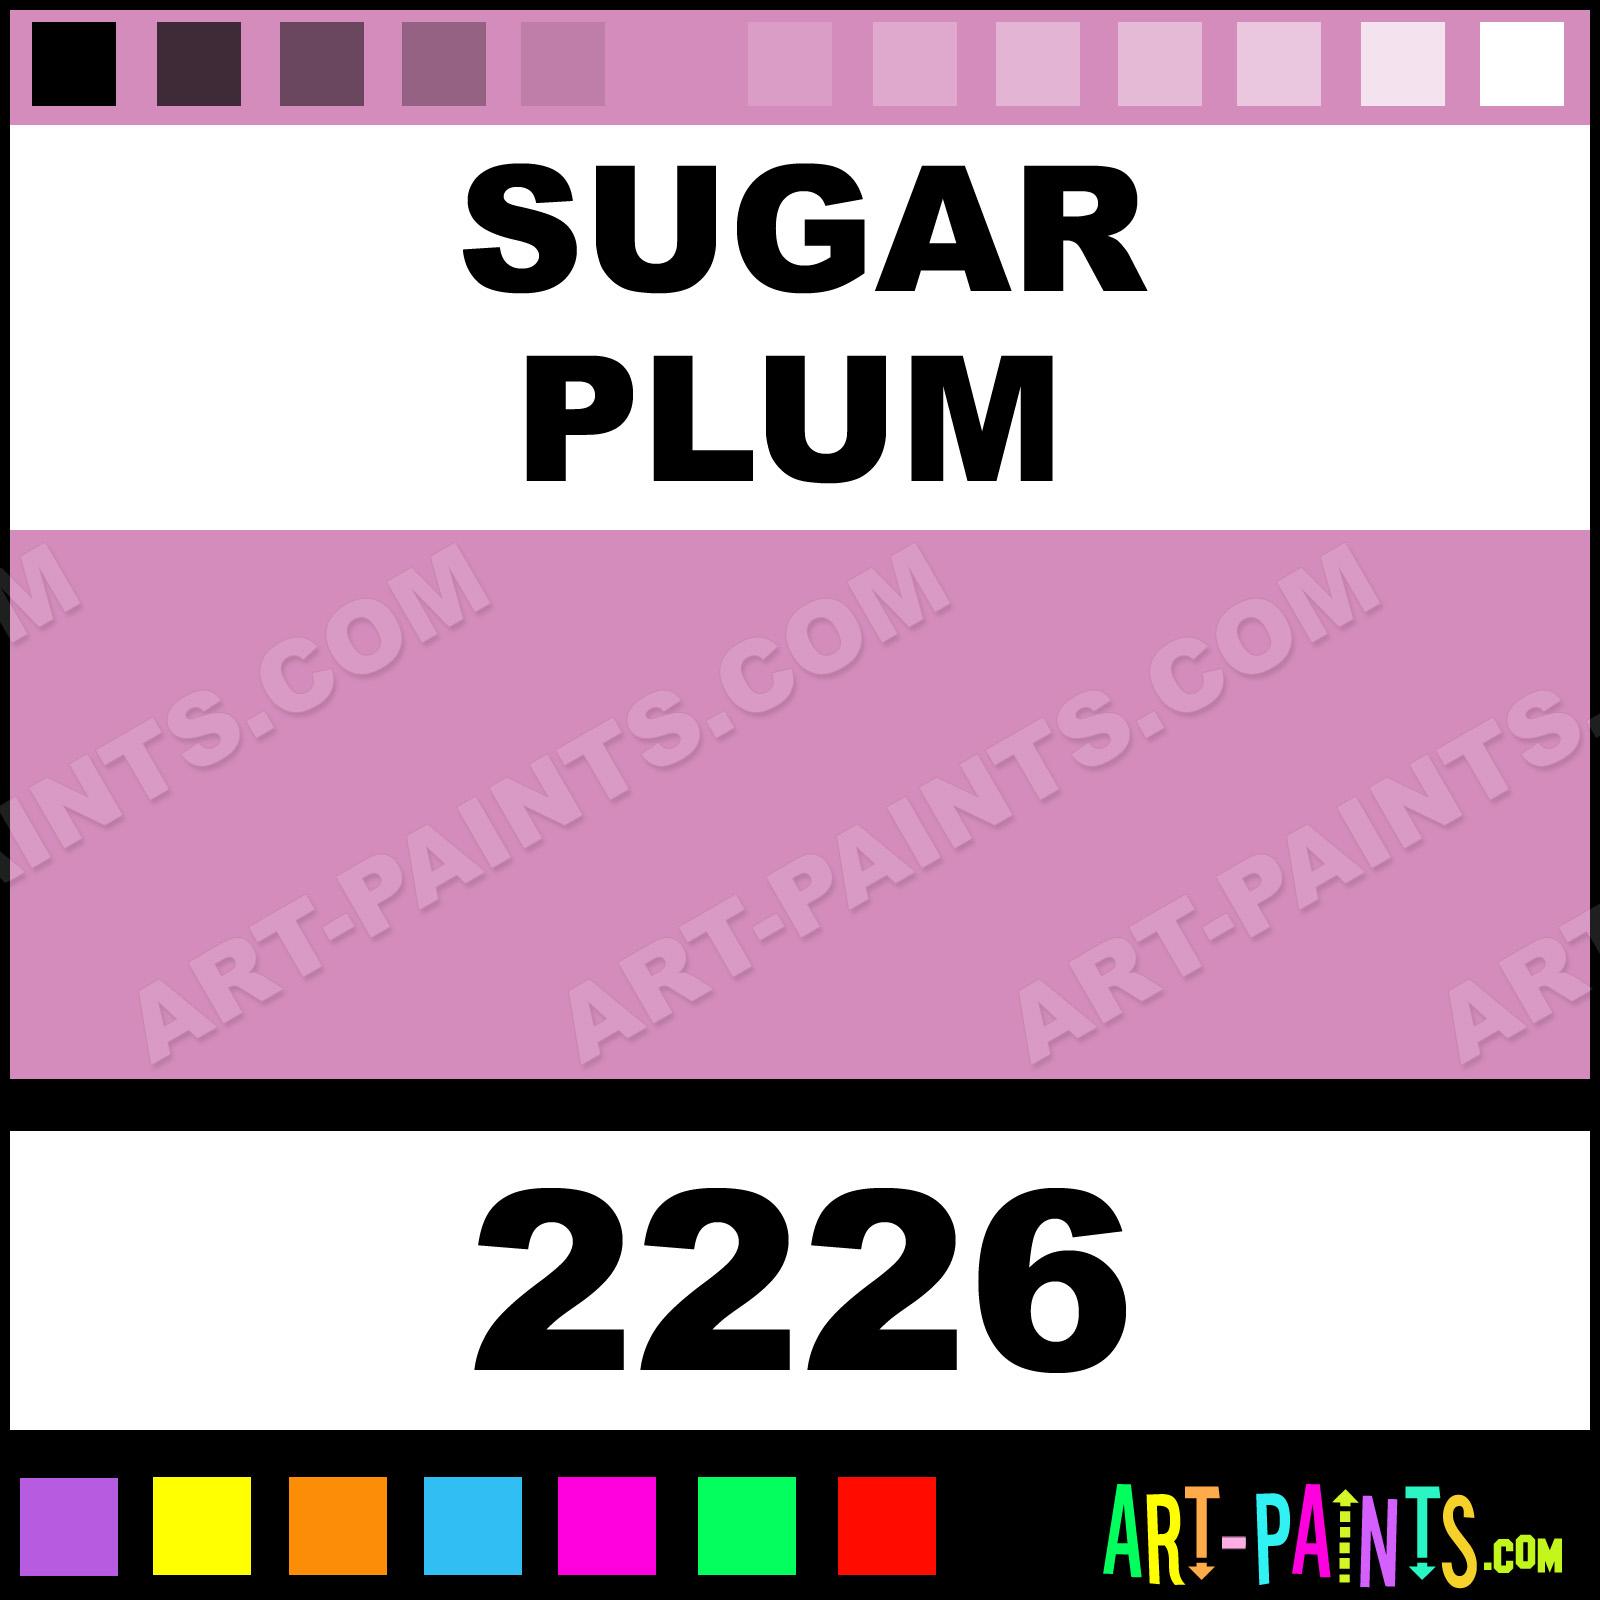 Folk art color chart acrylic paint - Sugar Plum Sugar Plum Paint